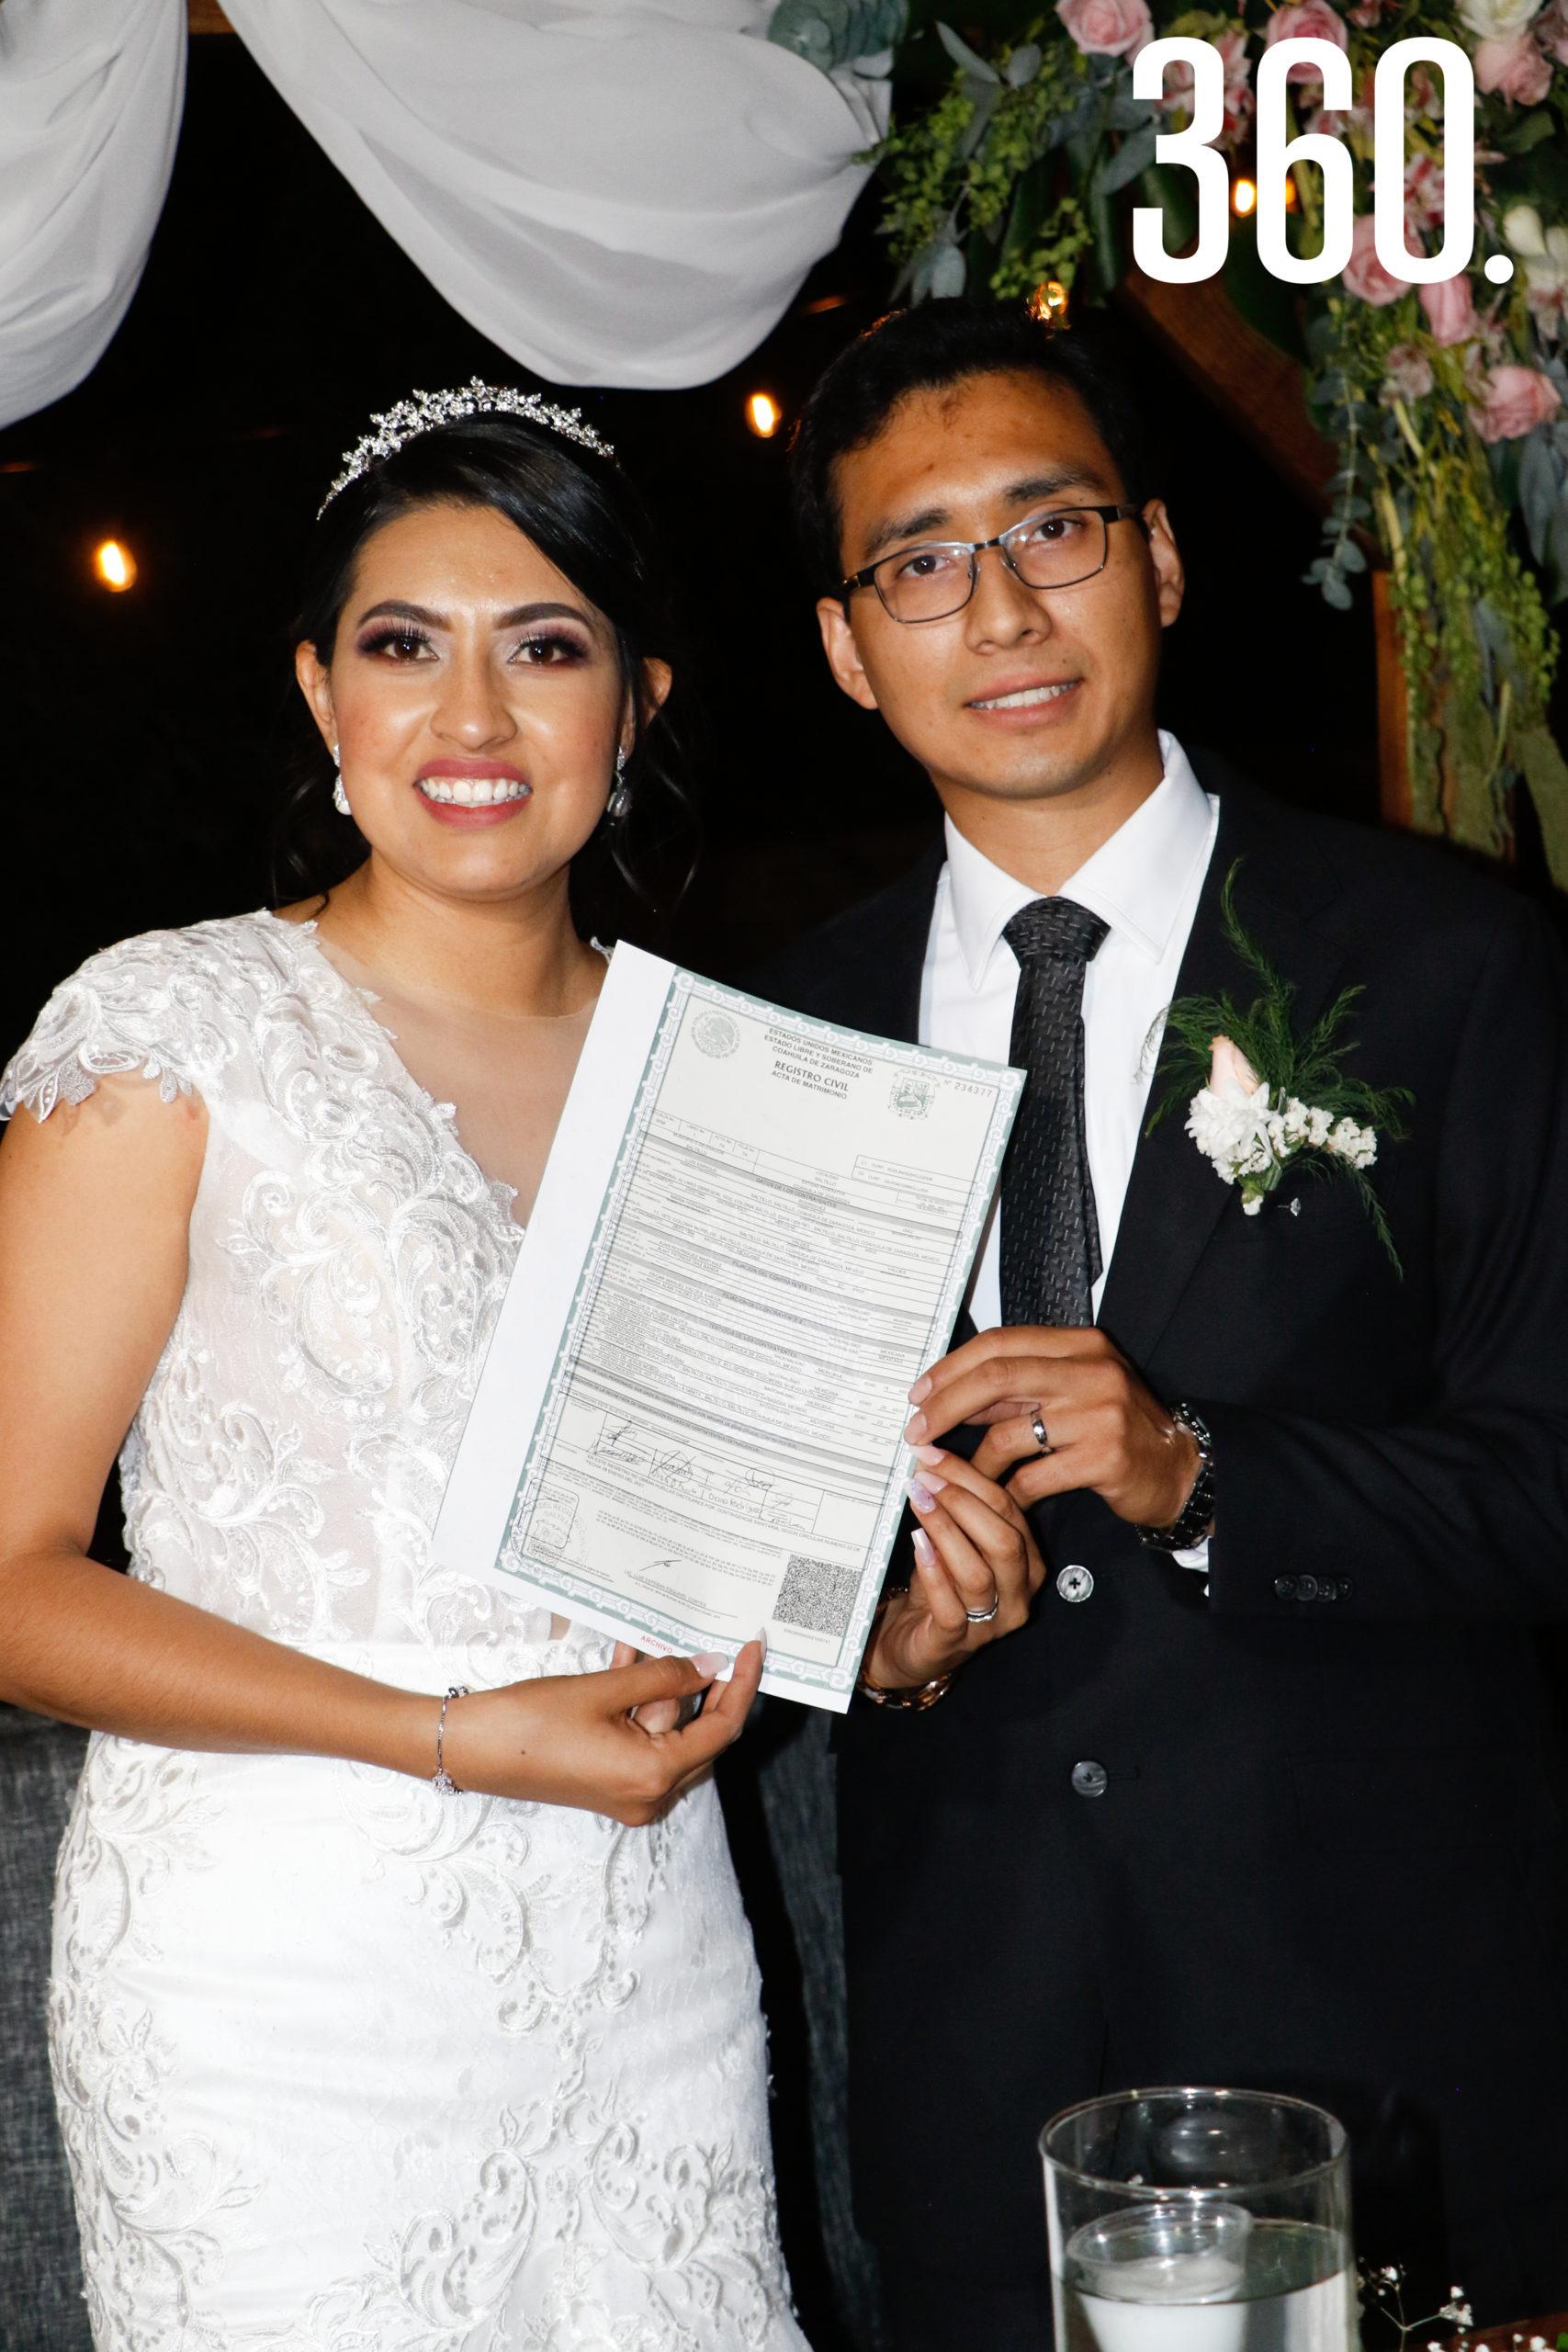 Oficialmente casados.